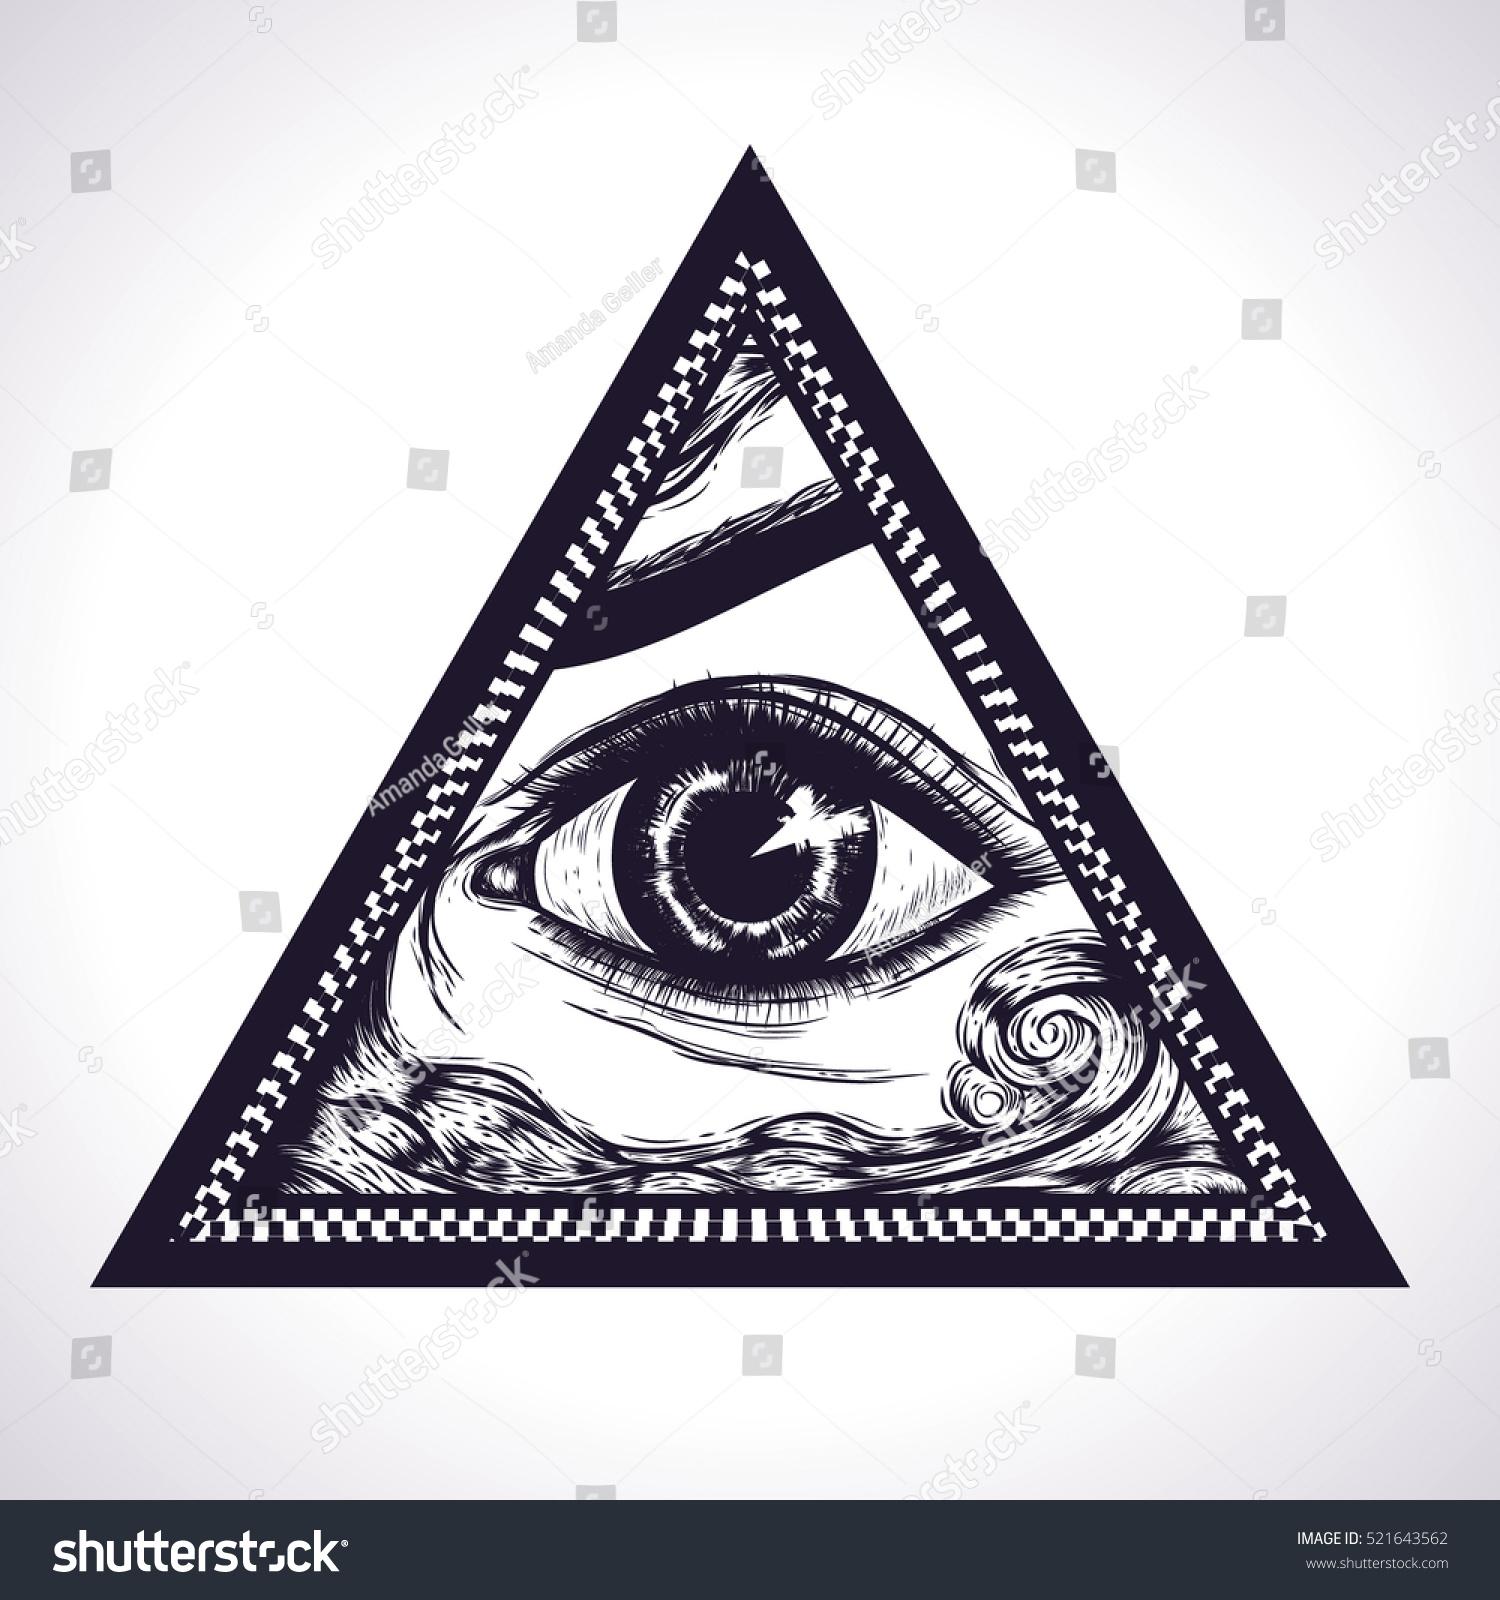 All Seeing Eye Pyramid Symbol New Stock Vector 521643562 Shutterstock